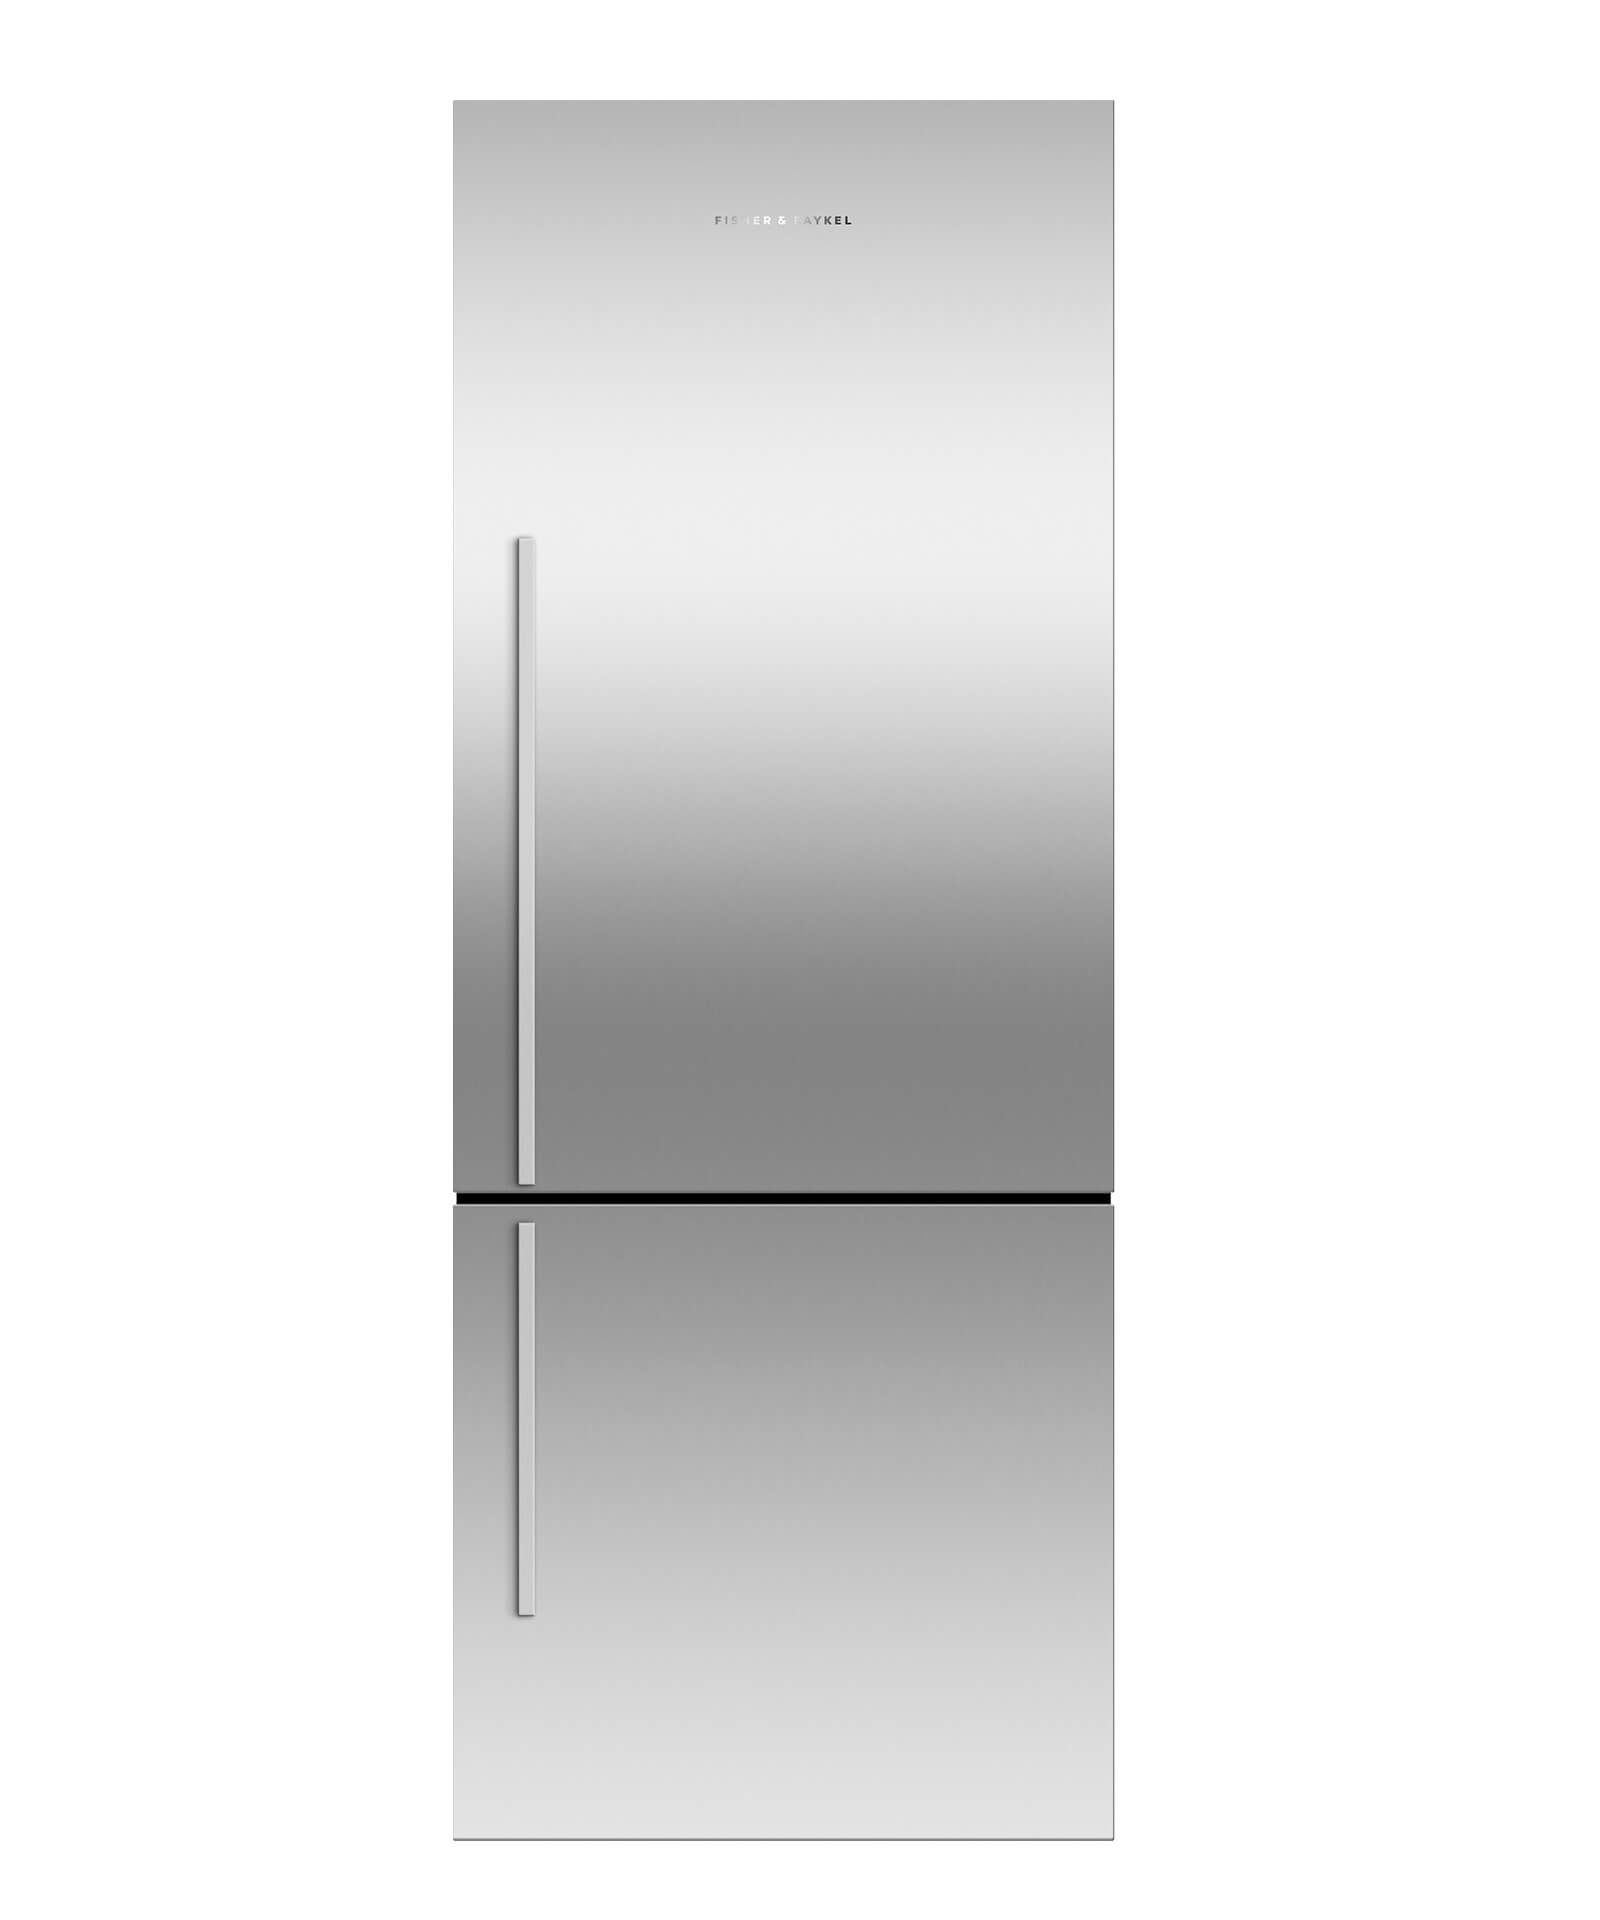 Fridge Freezer 635mm 364l Top Freezer Refrigerator Nutritious Meals Kitchen Appliances